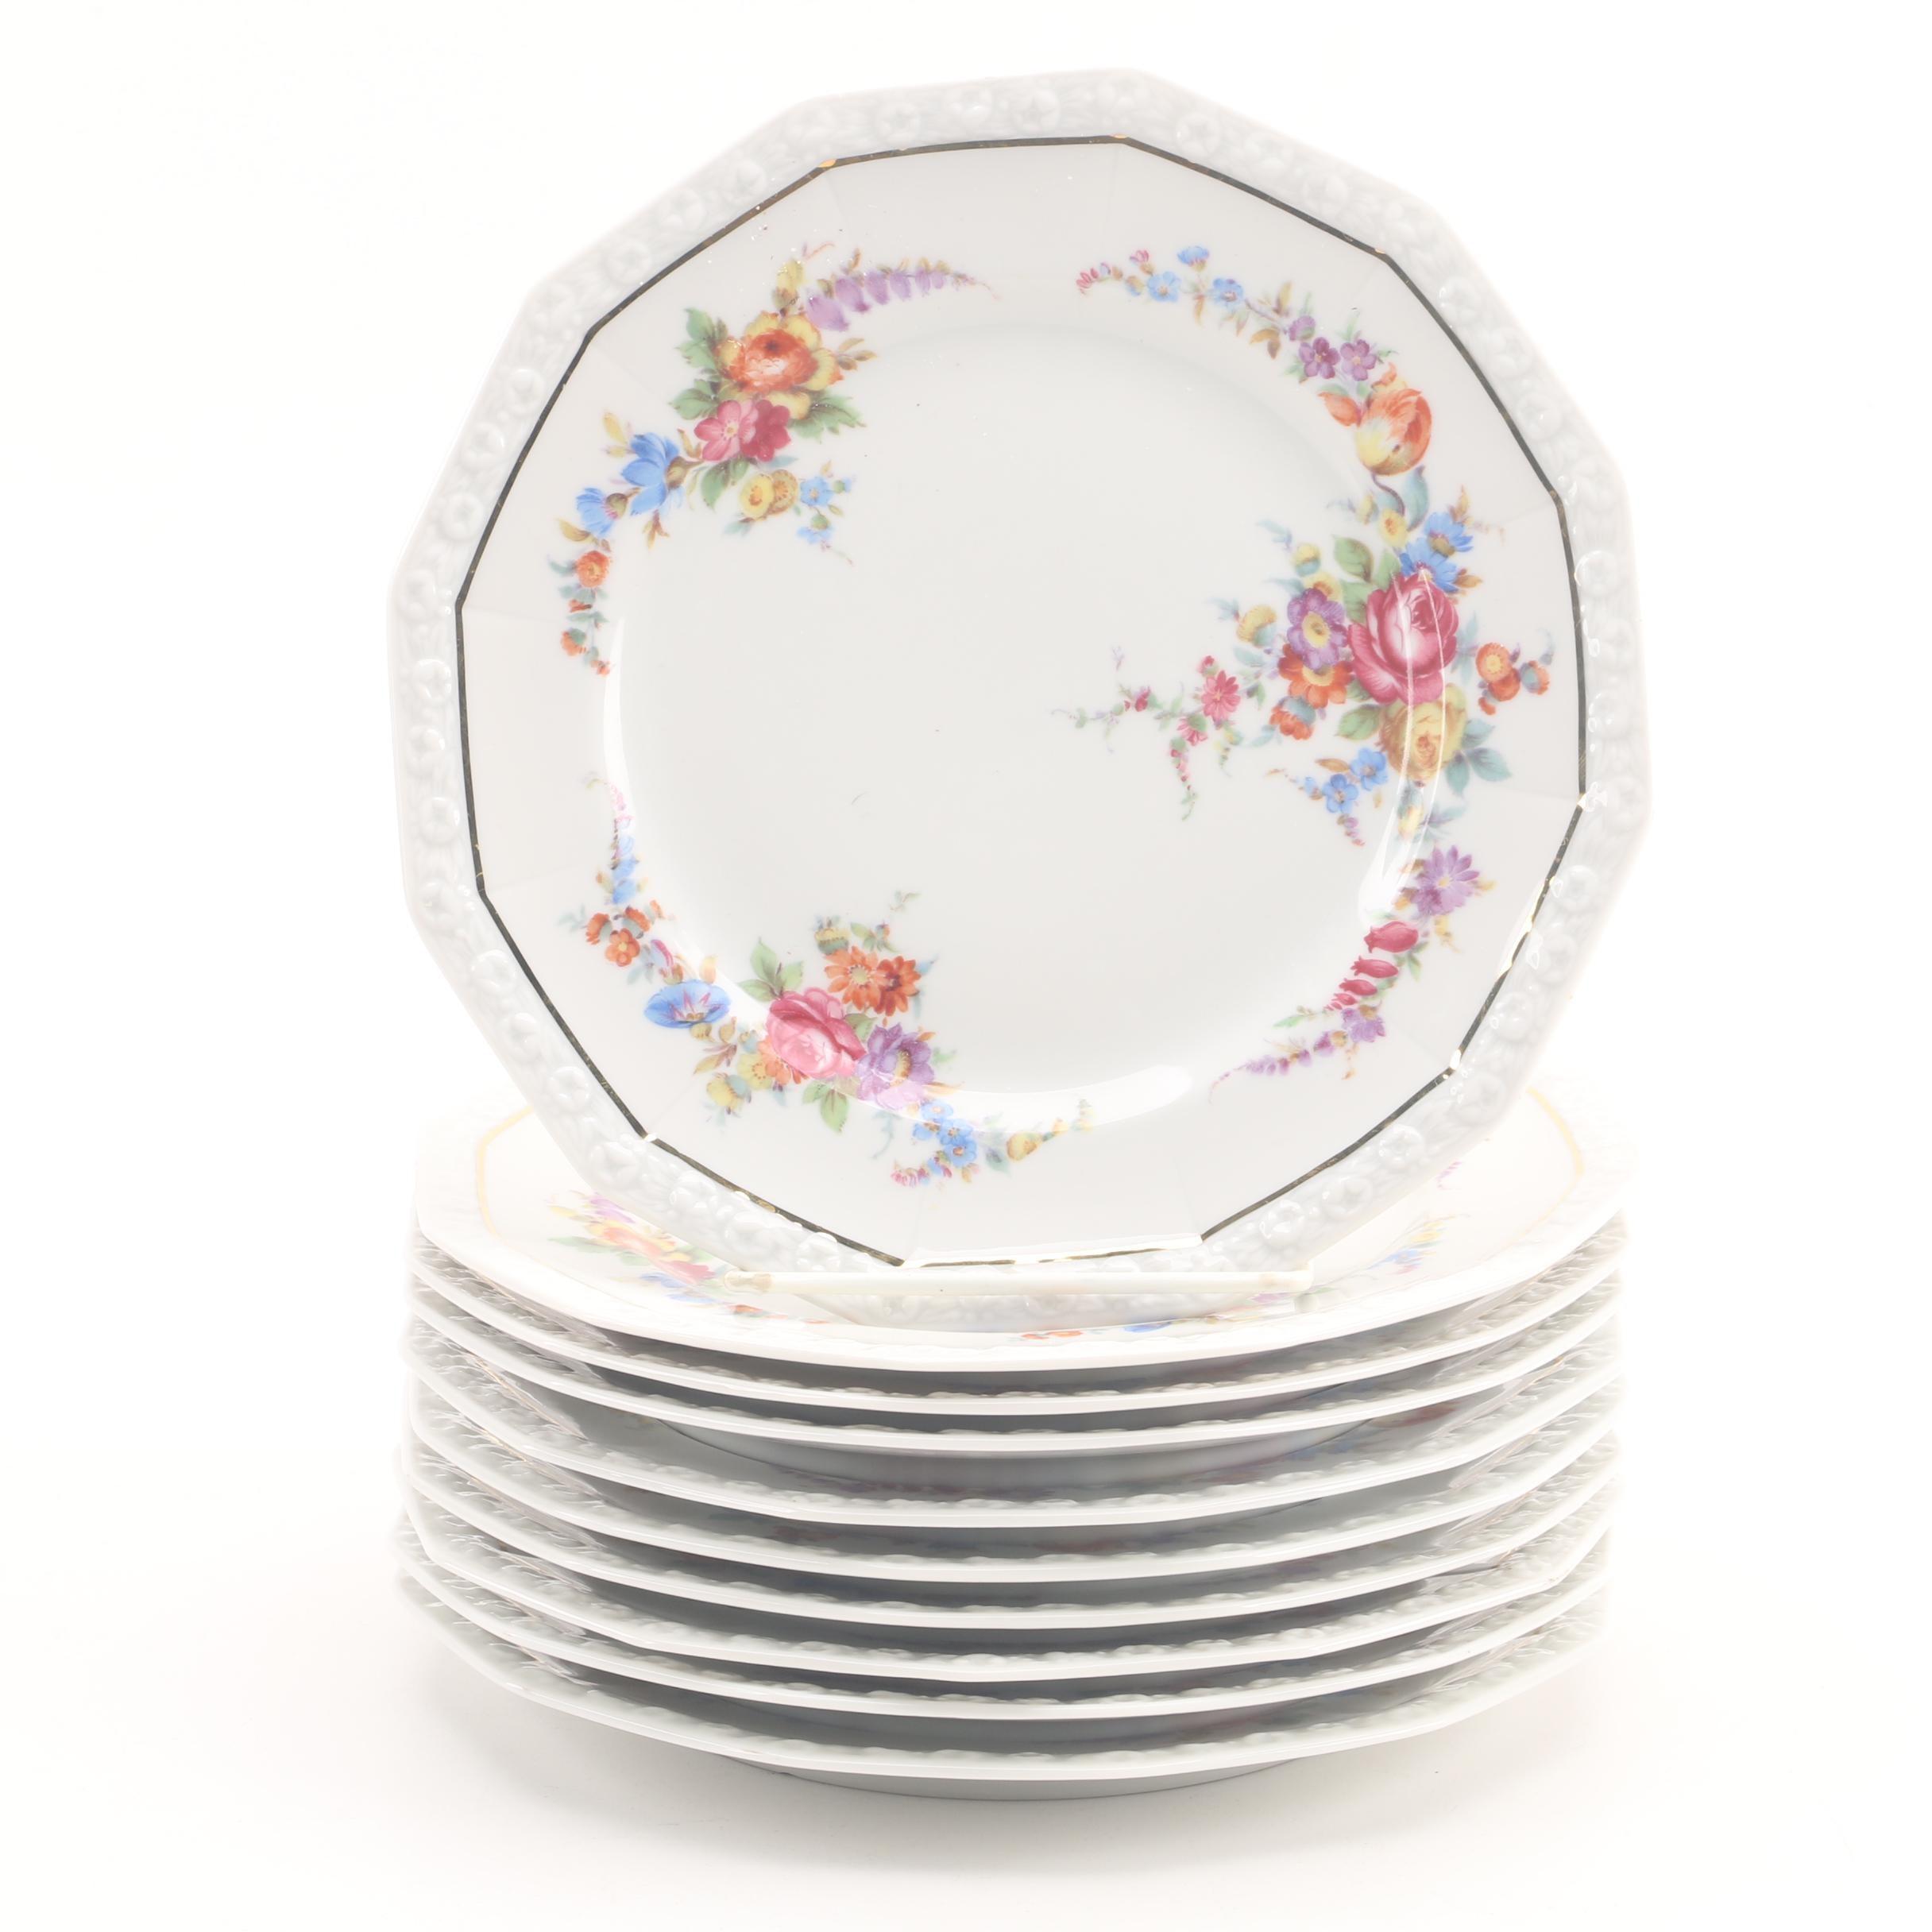 "1945-49 Rosenthal ""Maria"" Porcelain Salad Plates"